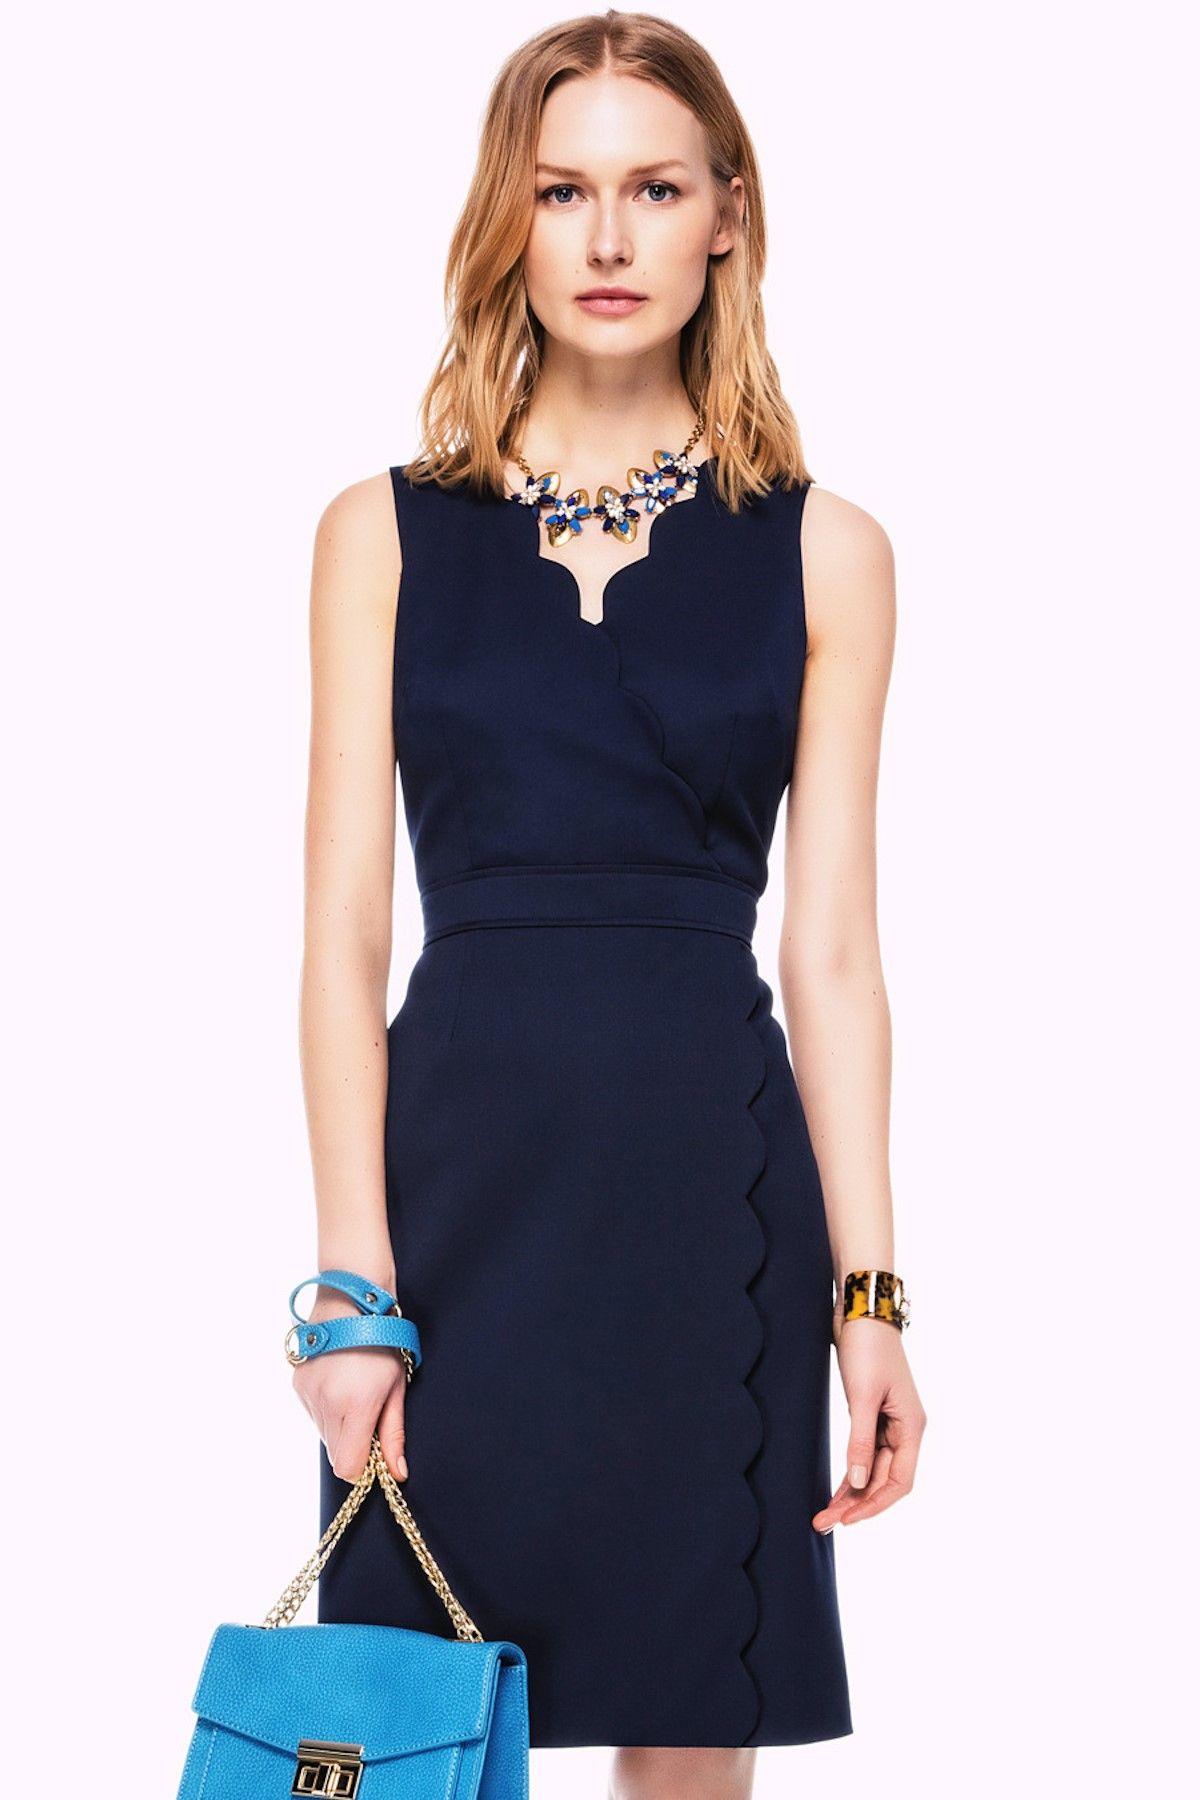 Lacivert Elbise Is1150002146 Elbise Elbise Modelleri Giyim